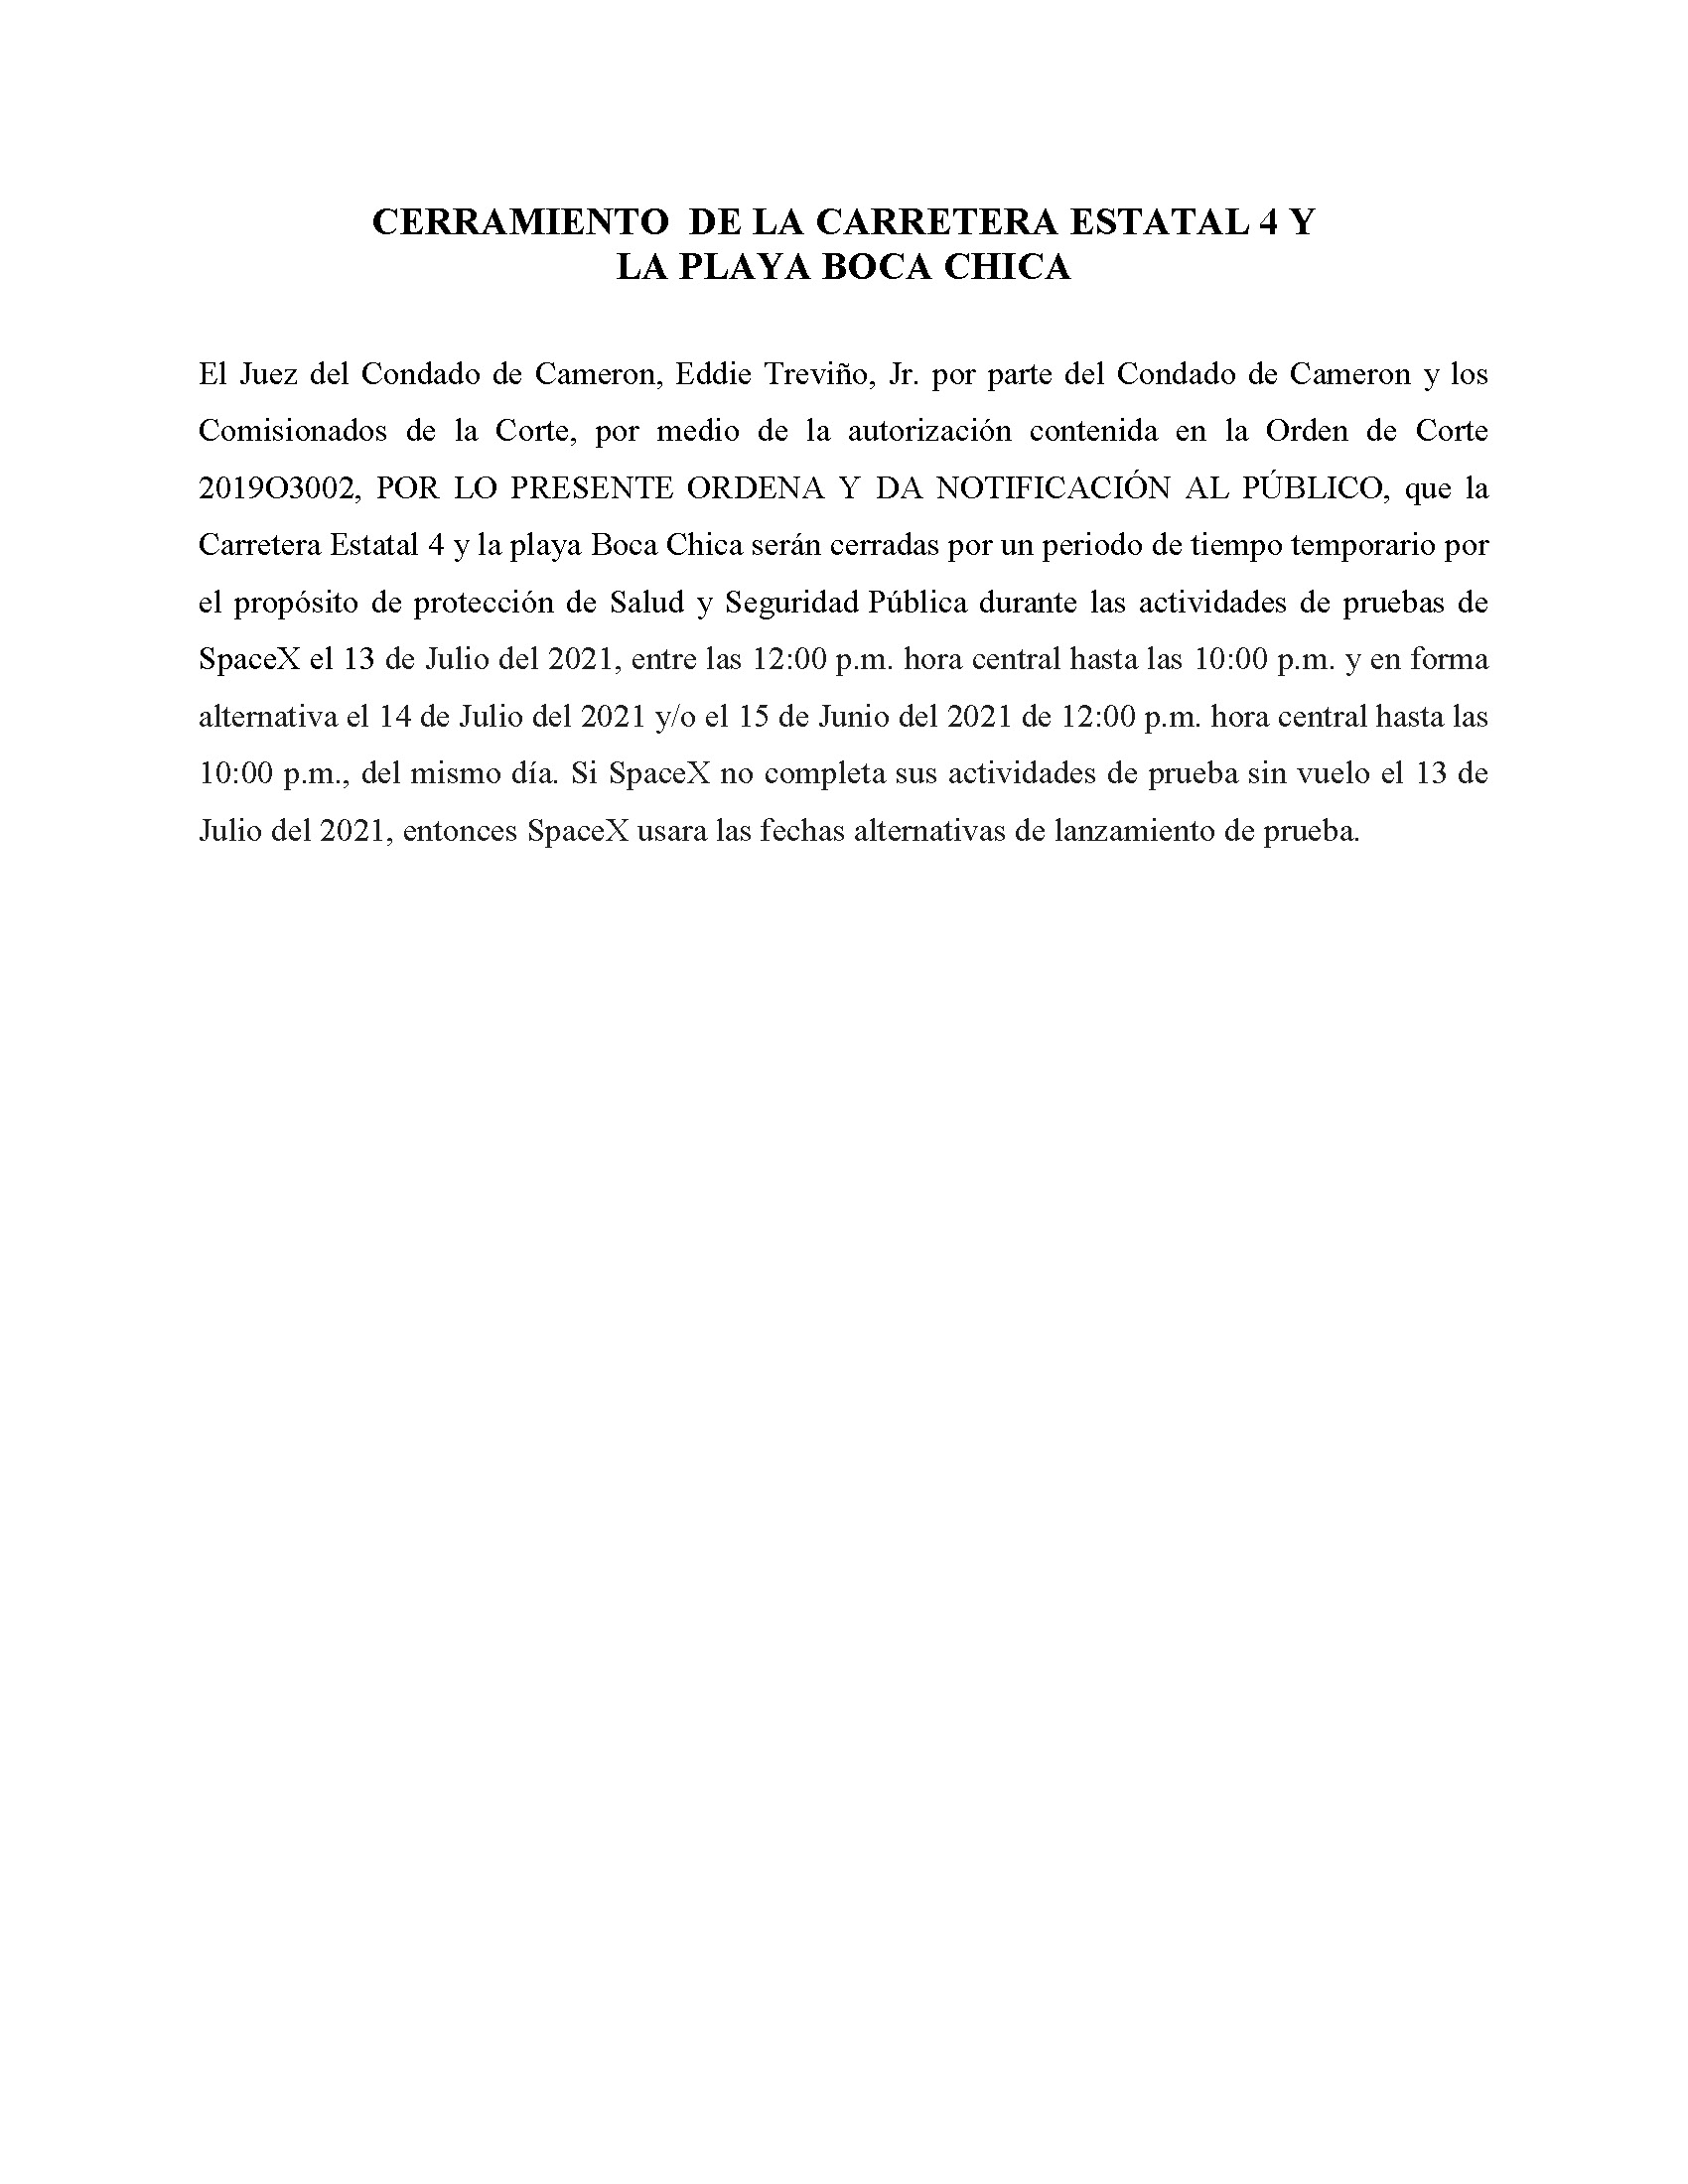 ORDER.CLOSURE OF HIGHWAY 4 Y LA PLAYA BOCA CHICA.SPANISH.07.13.2021